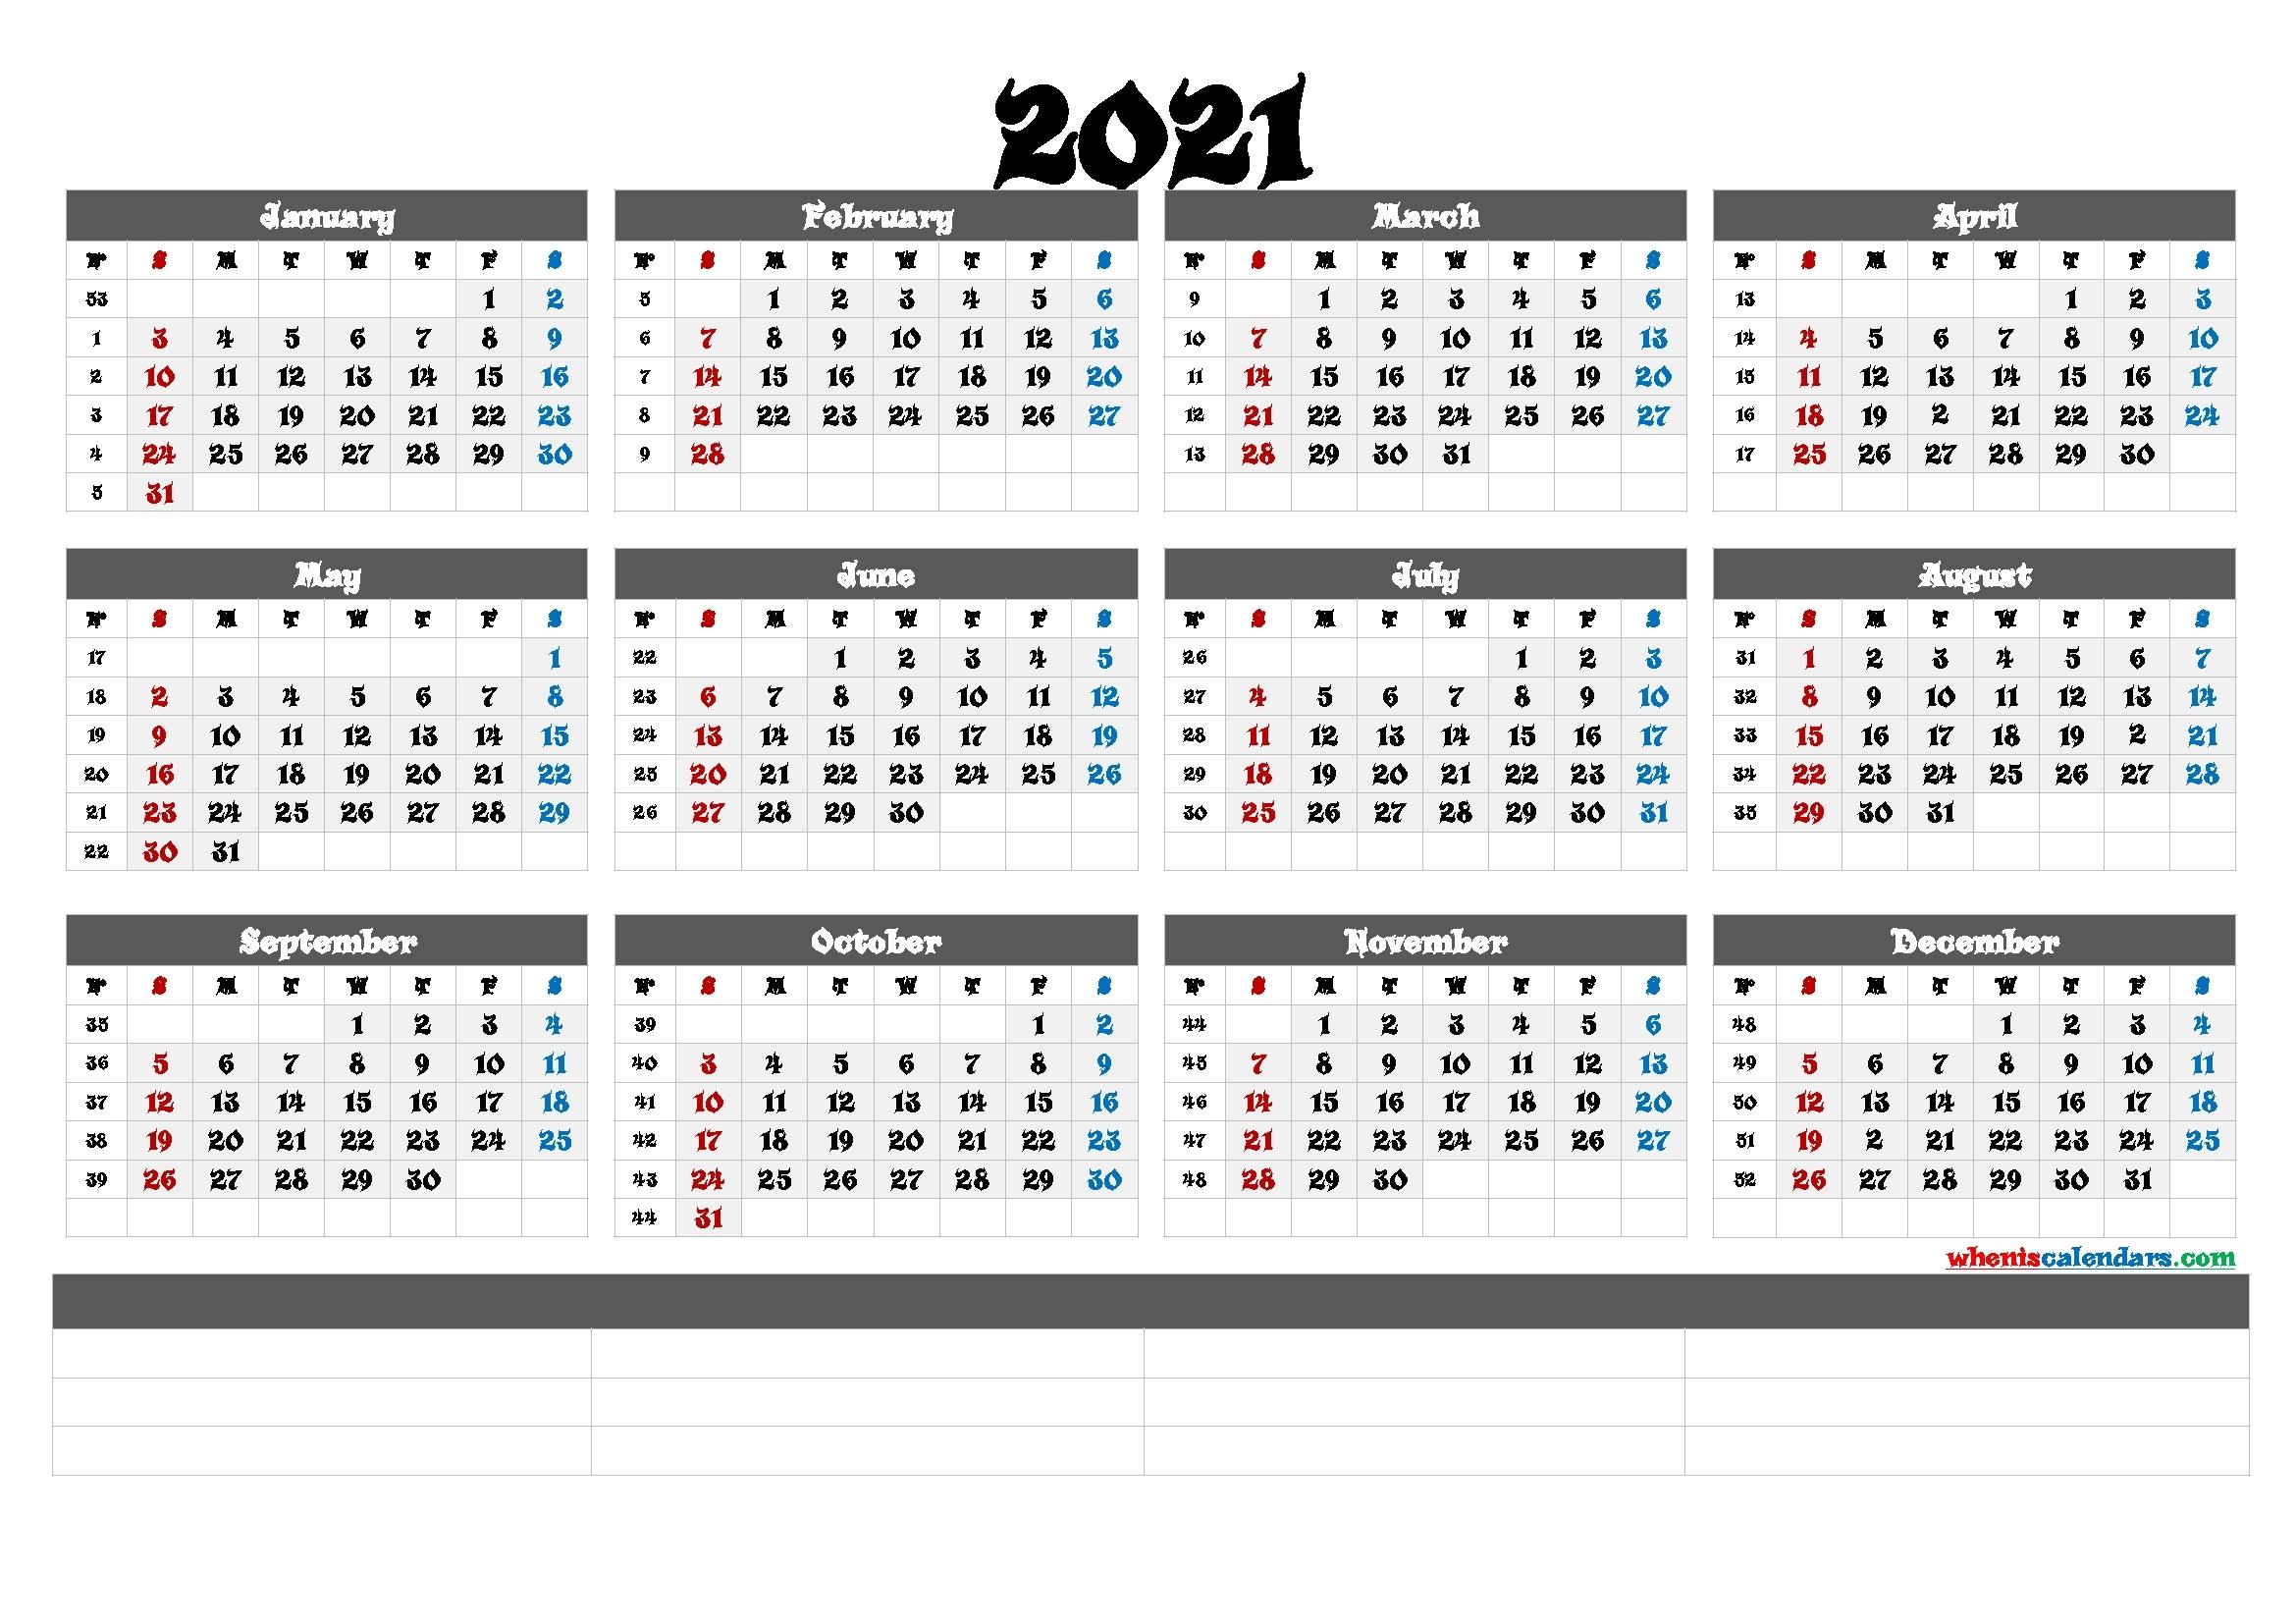 Calendar 2021 With Weeks Number Template | Calendar ...